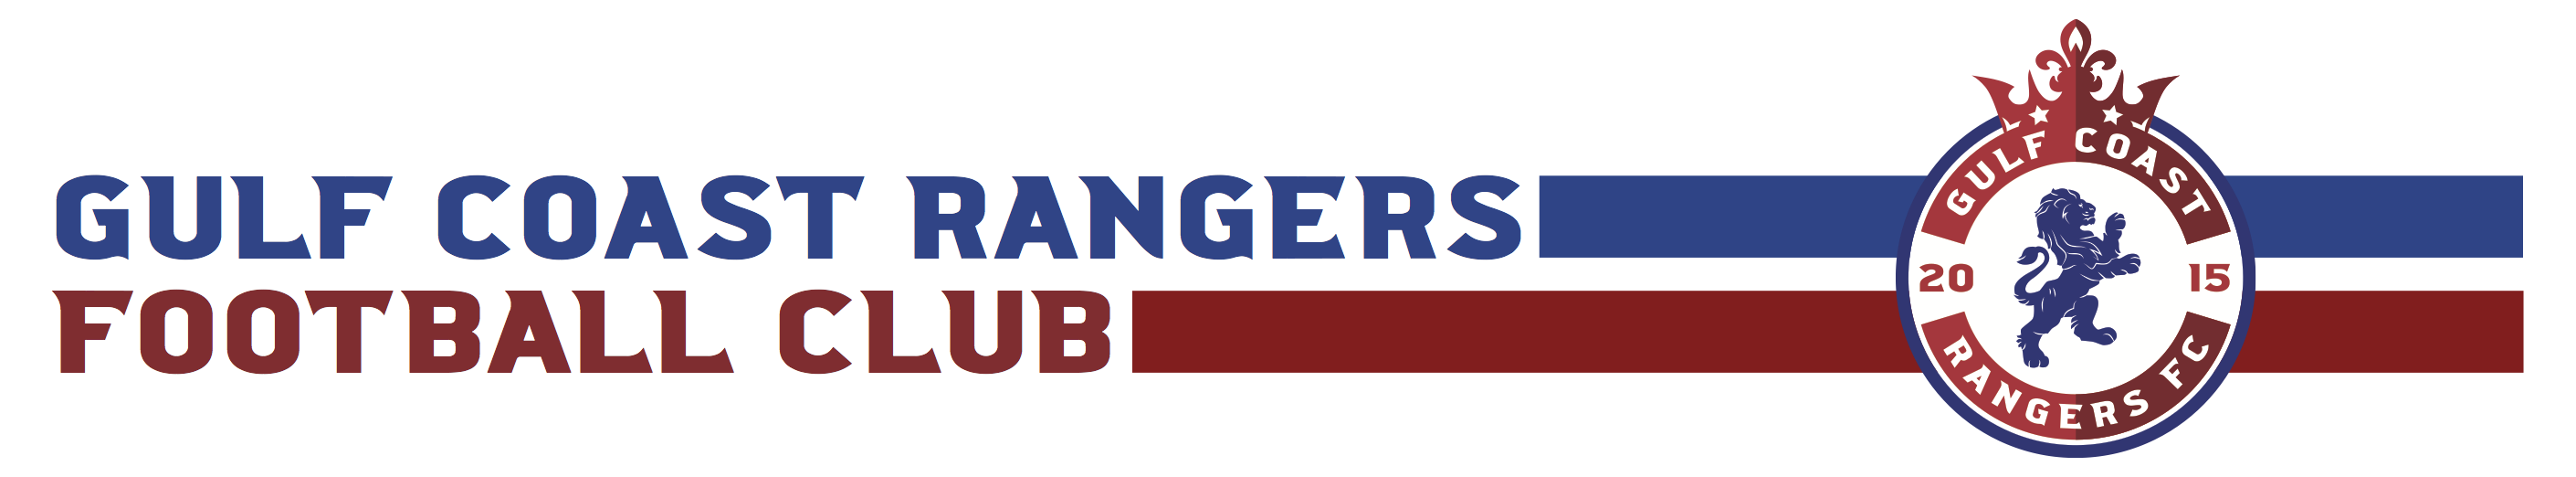 Rangers banner 2